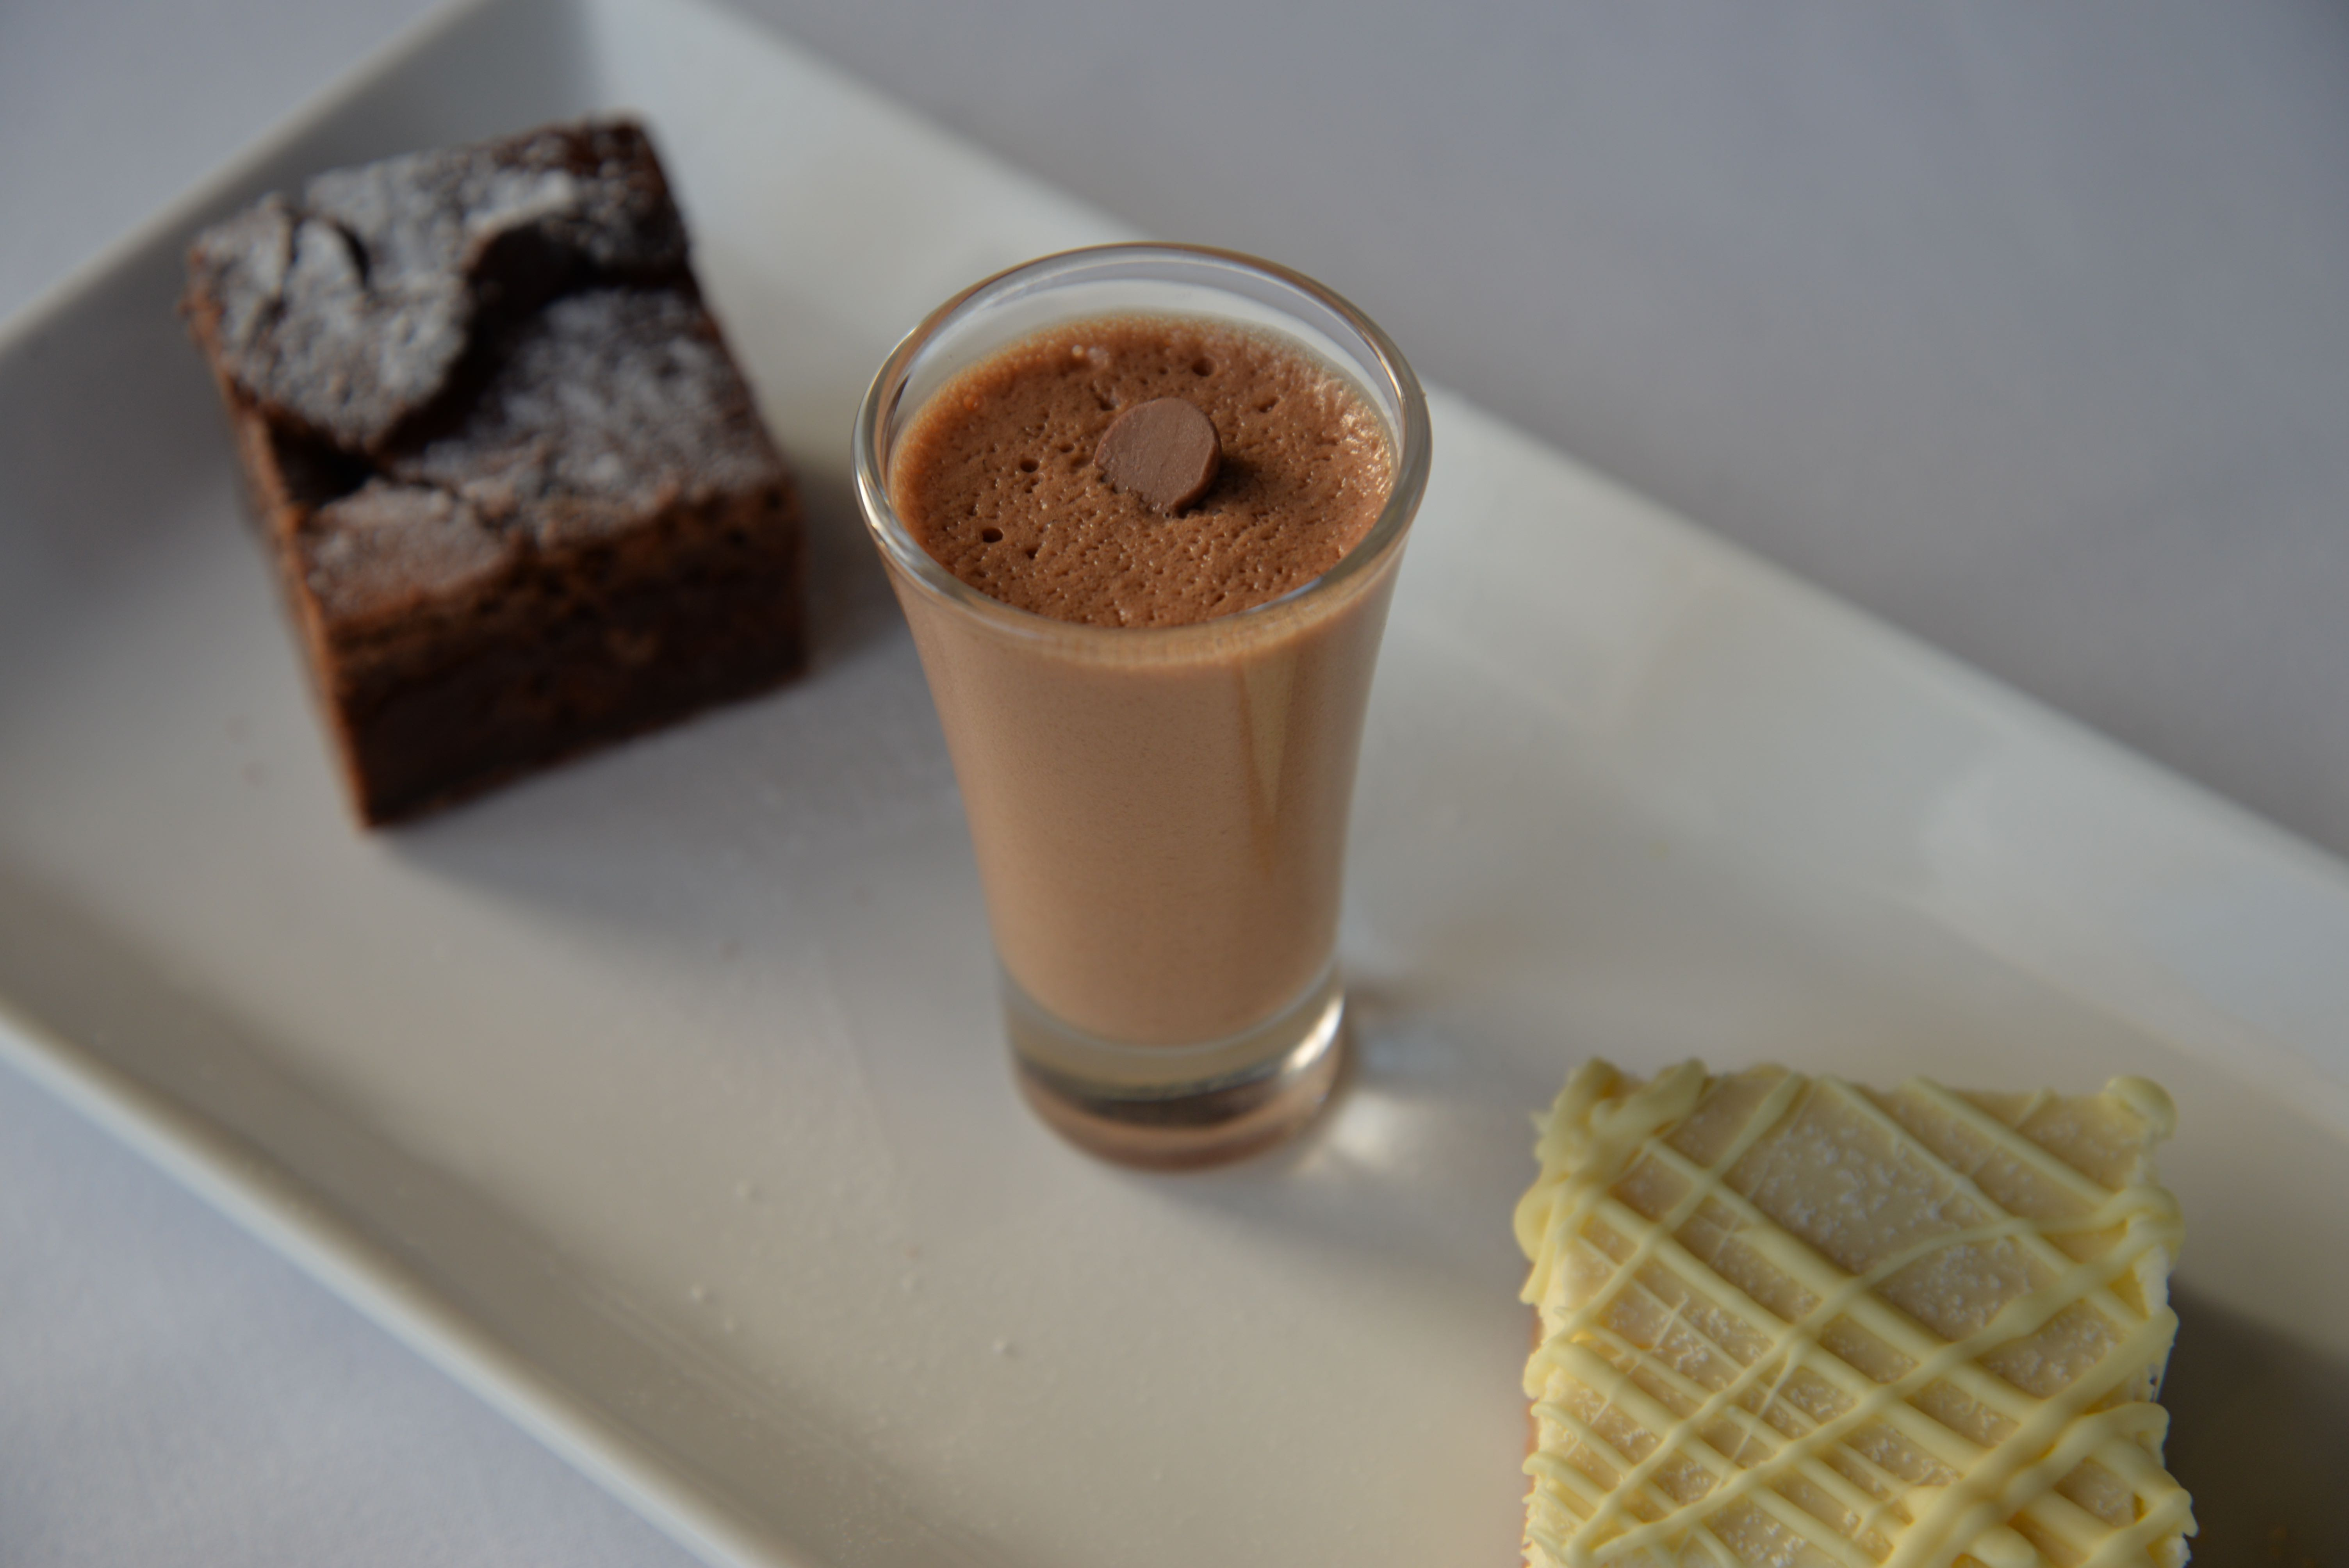 Trio of chocolate deserts